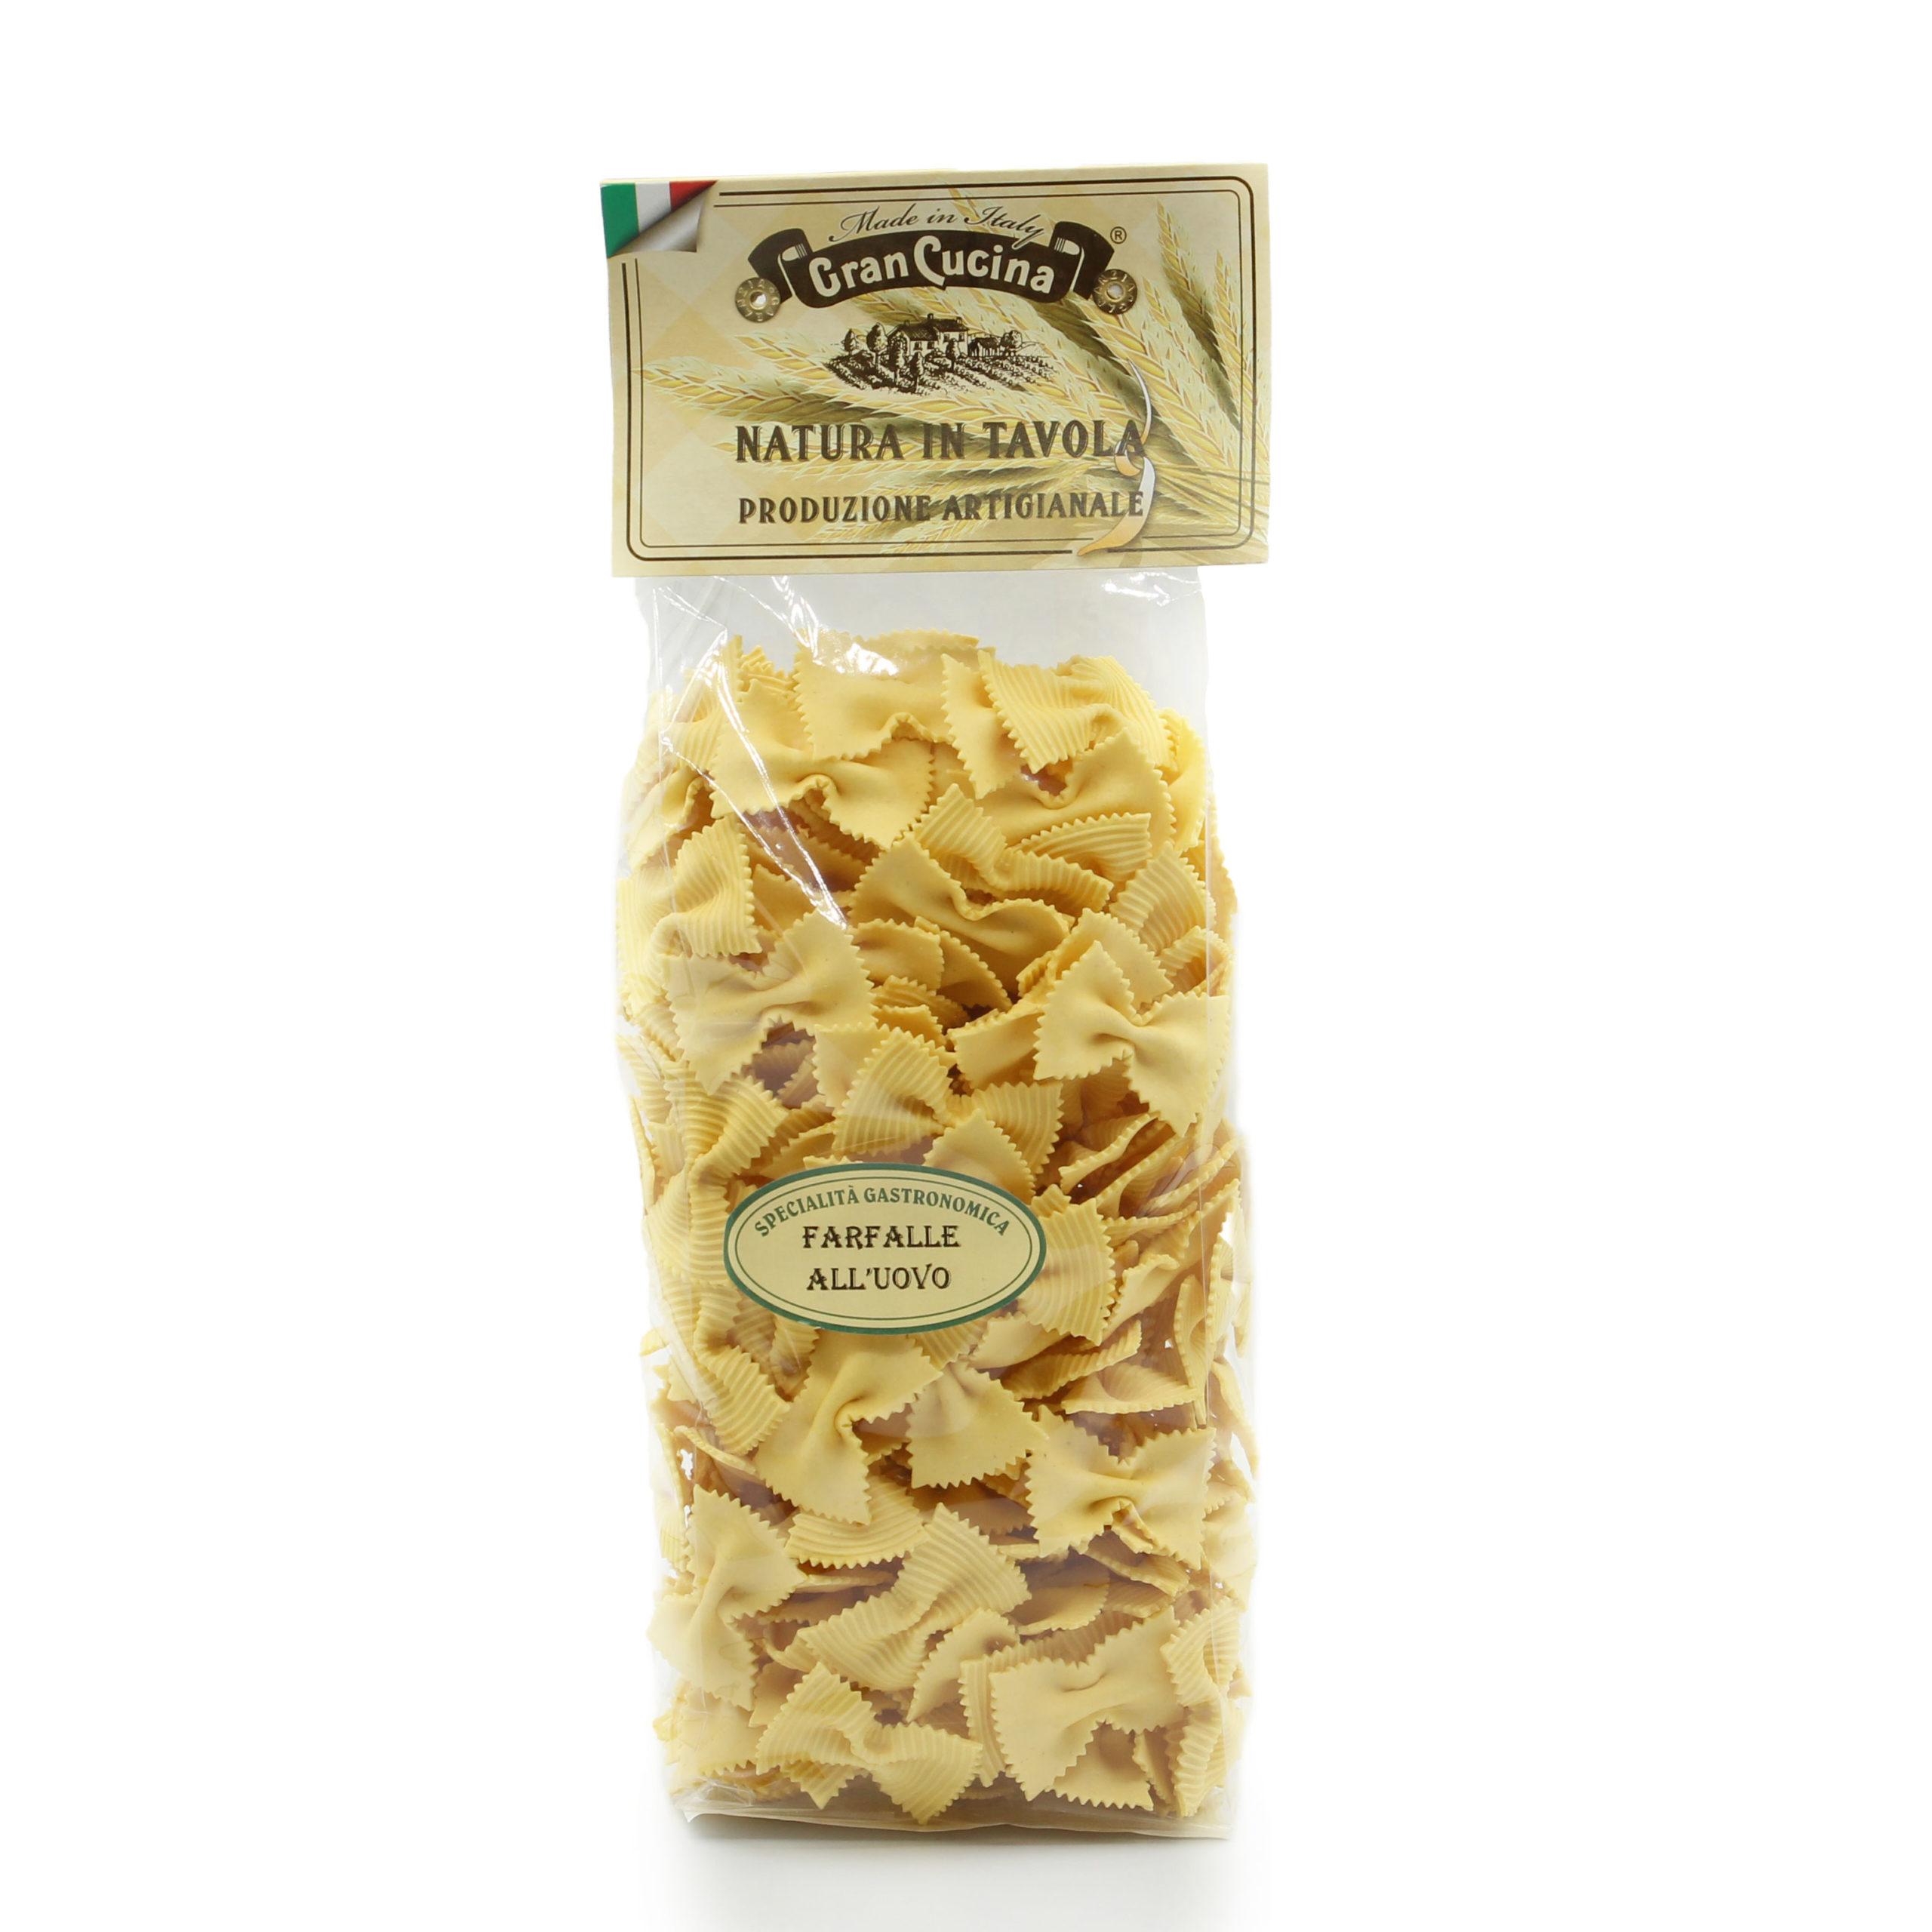 Farfalle All Uovo Gran Cucina Pasta Aus Piemont Italien